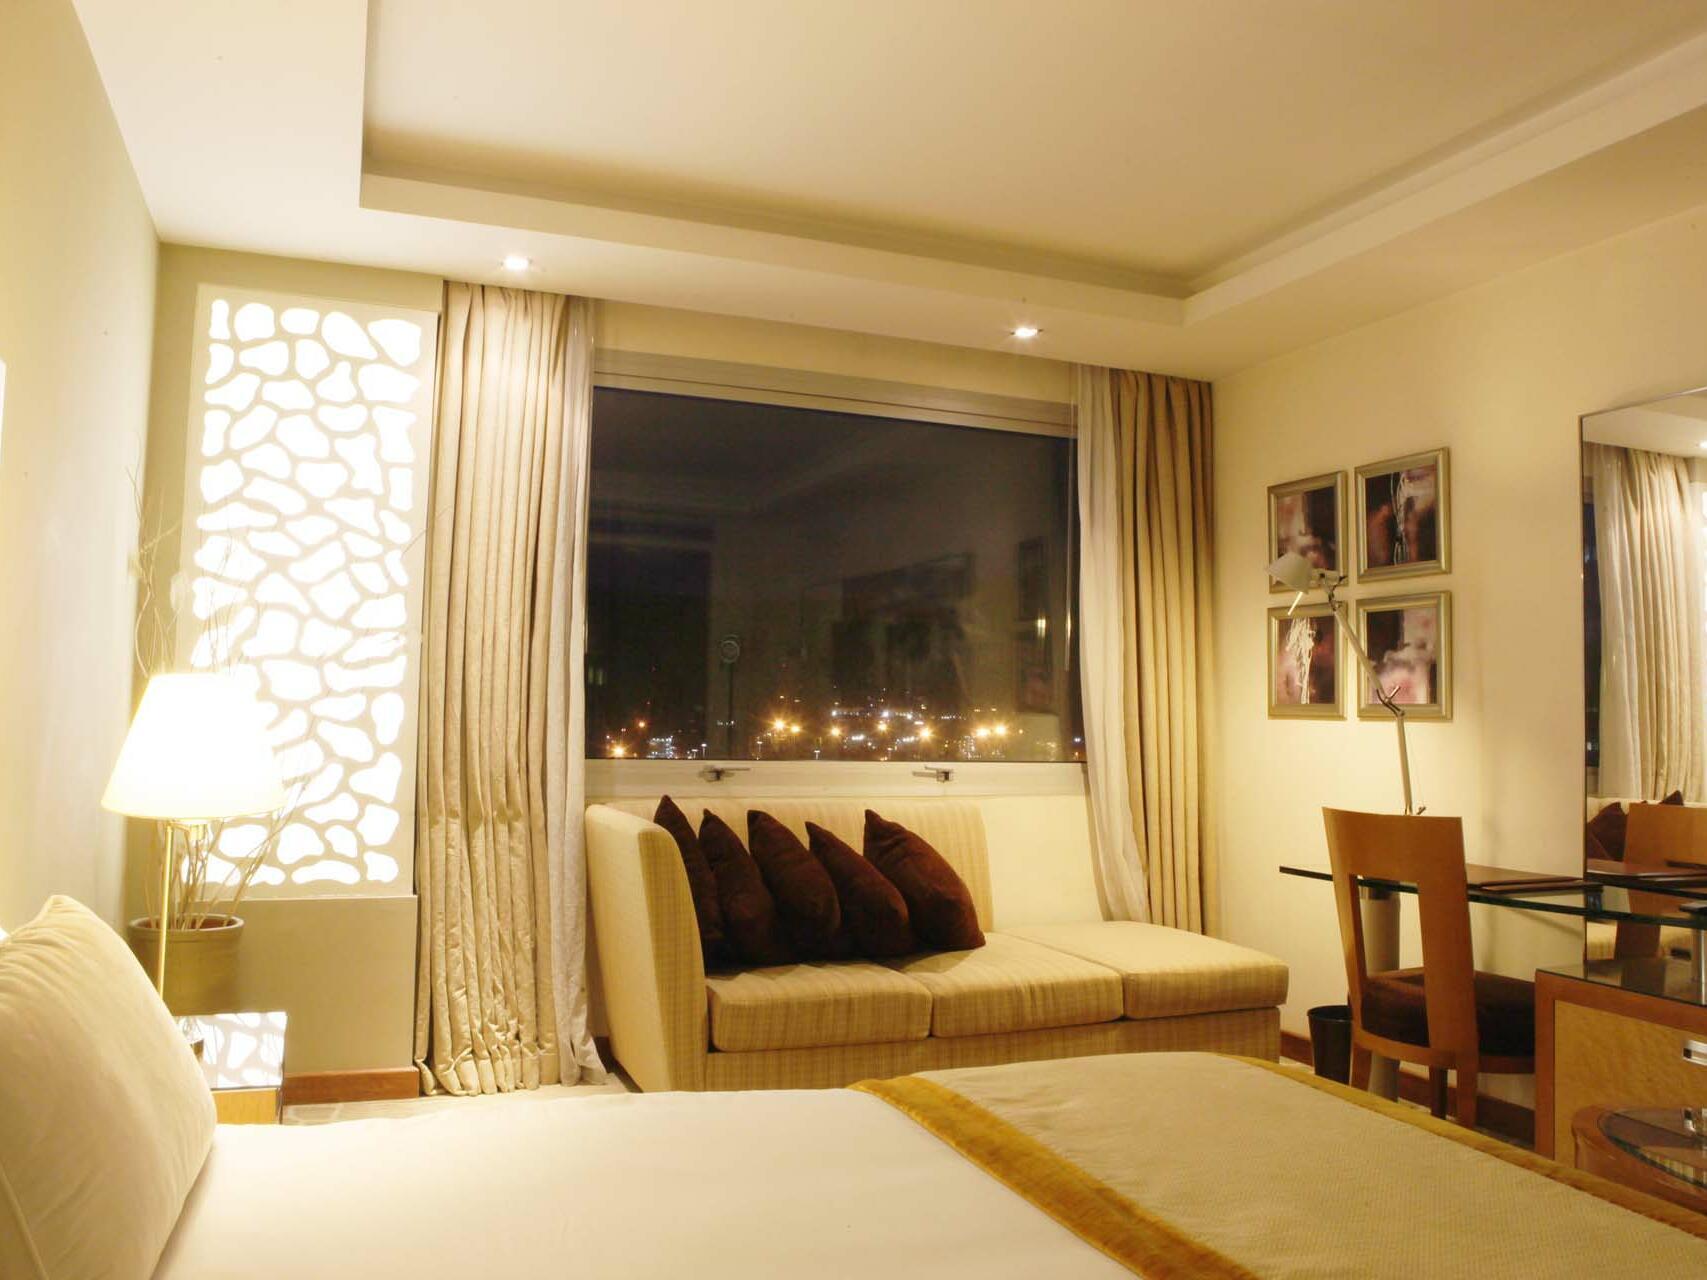 Bedroom with a large Window -  Farah Casablanca Hotel